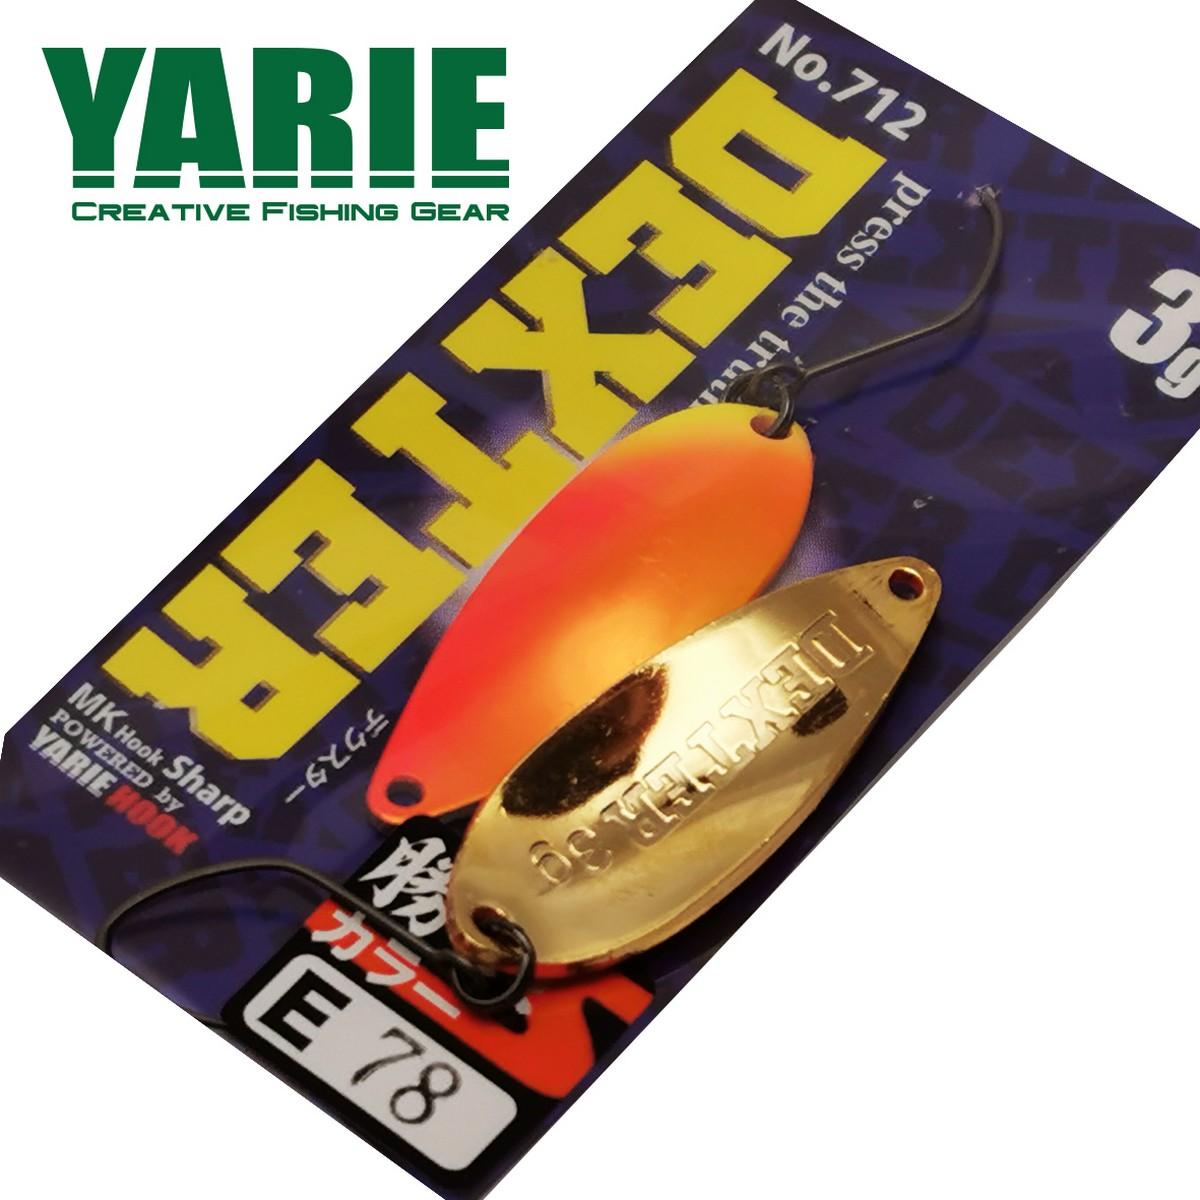 Блесна клатушка Yarie Dexter 3.0gr